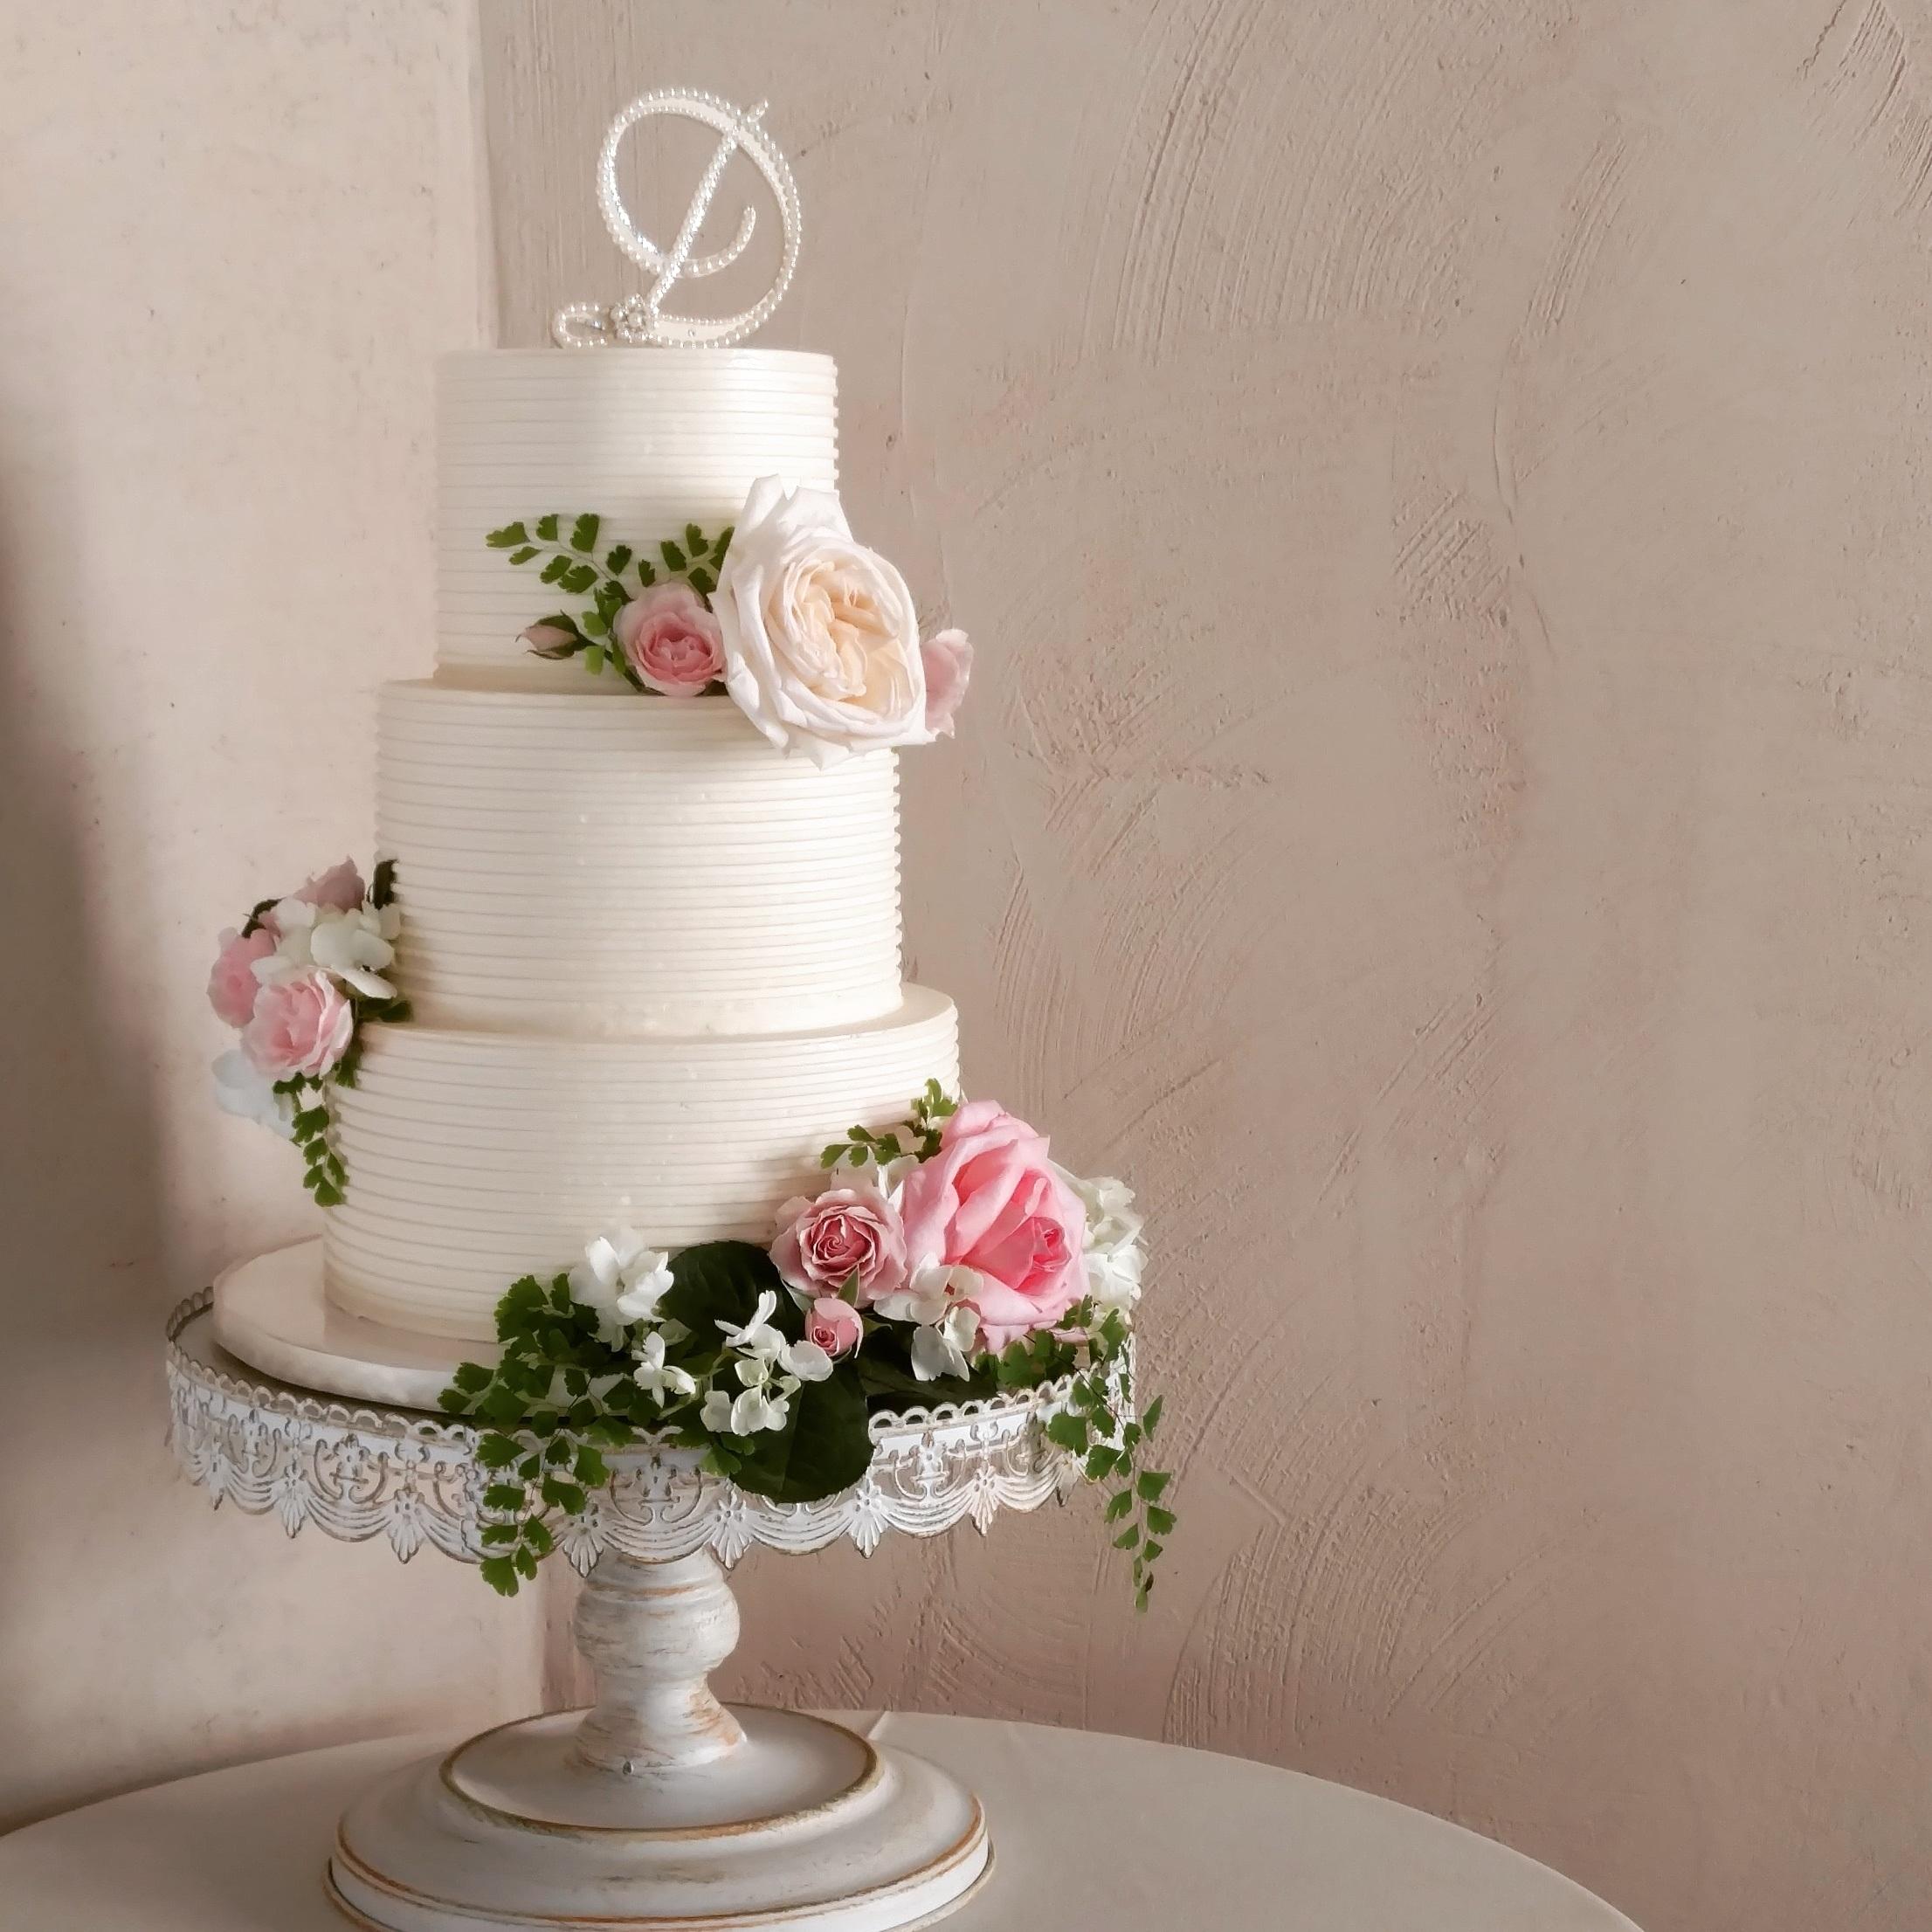 Wedding Cakes Wedding Cake Fresh: Wedding Cakes